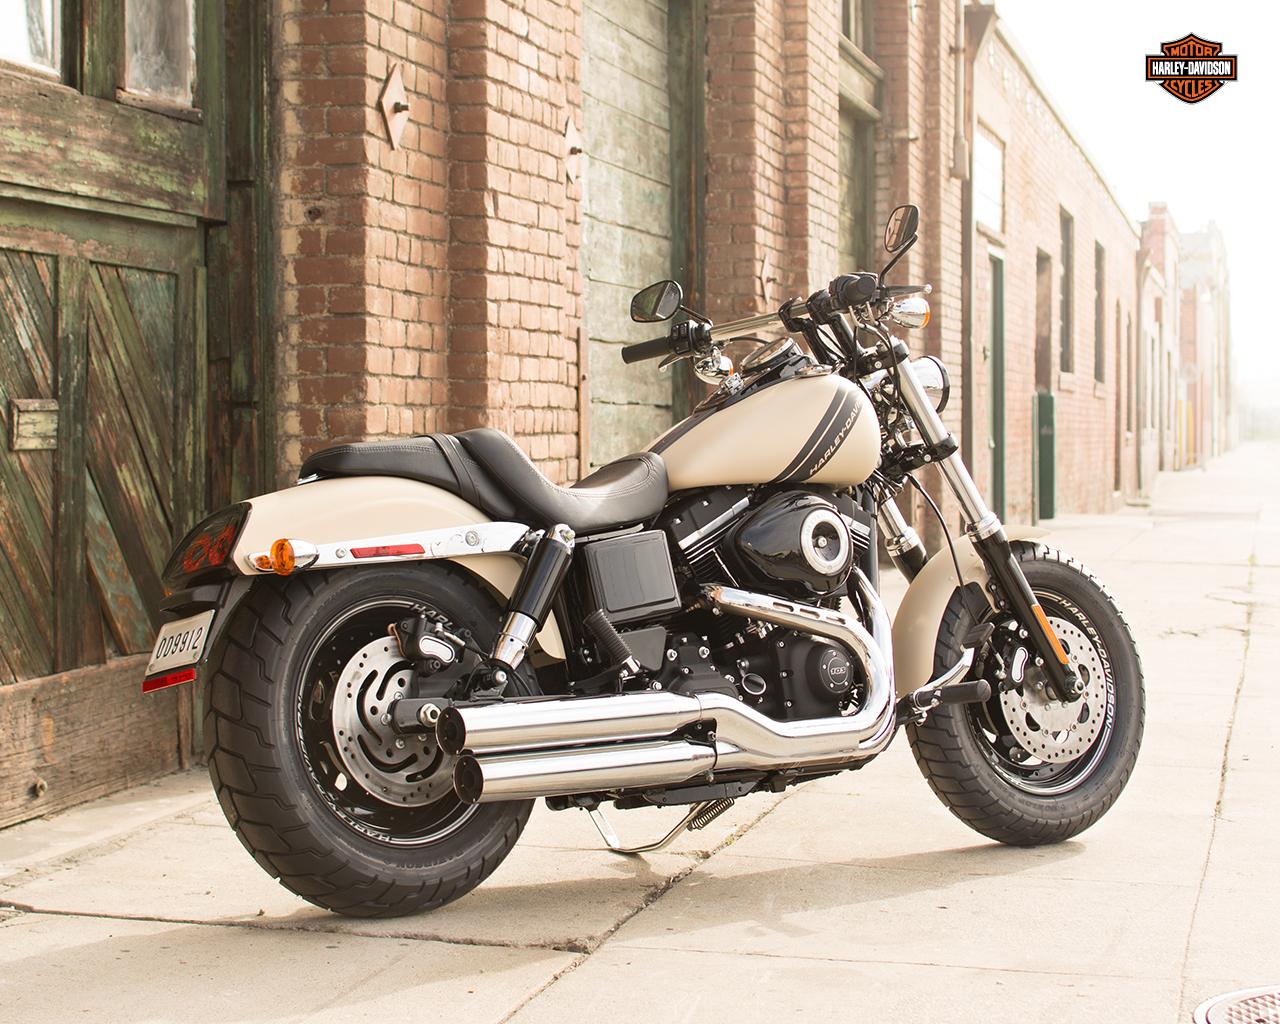 2015 Harley Davidson Fat Bob Is Unchanged Autoevolution